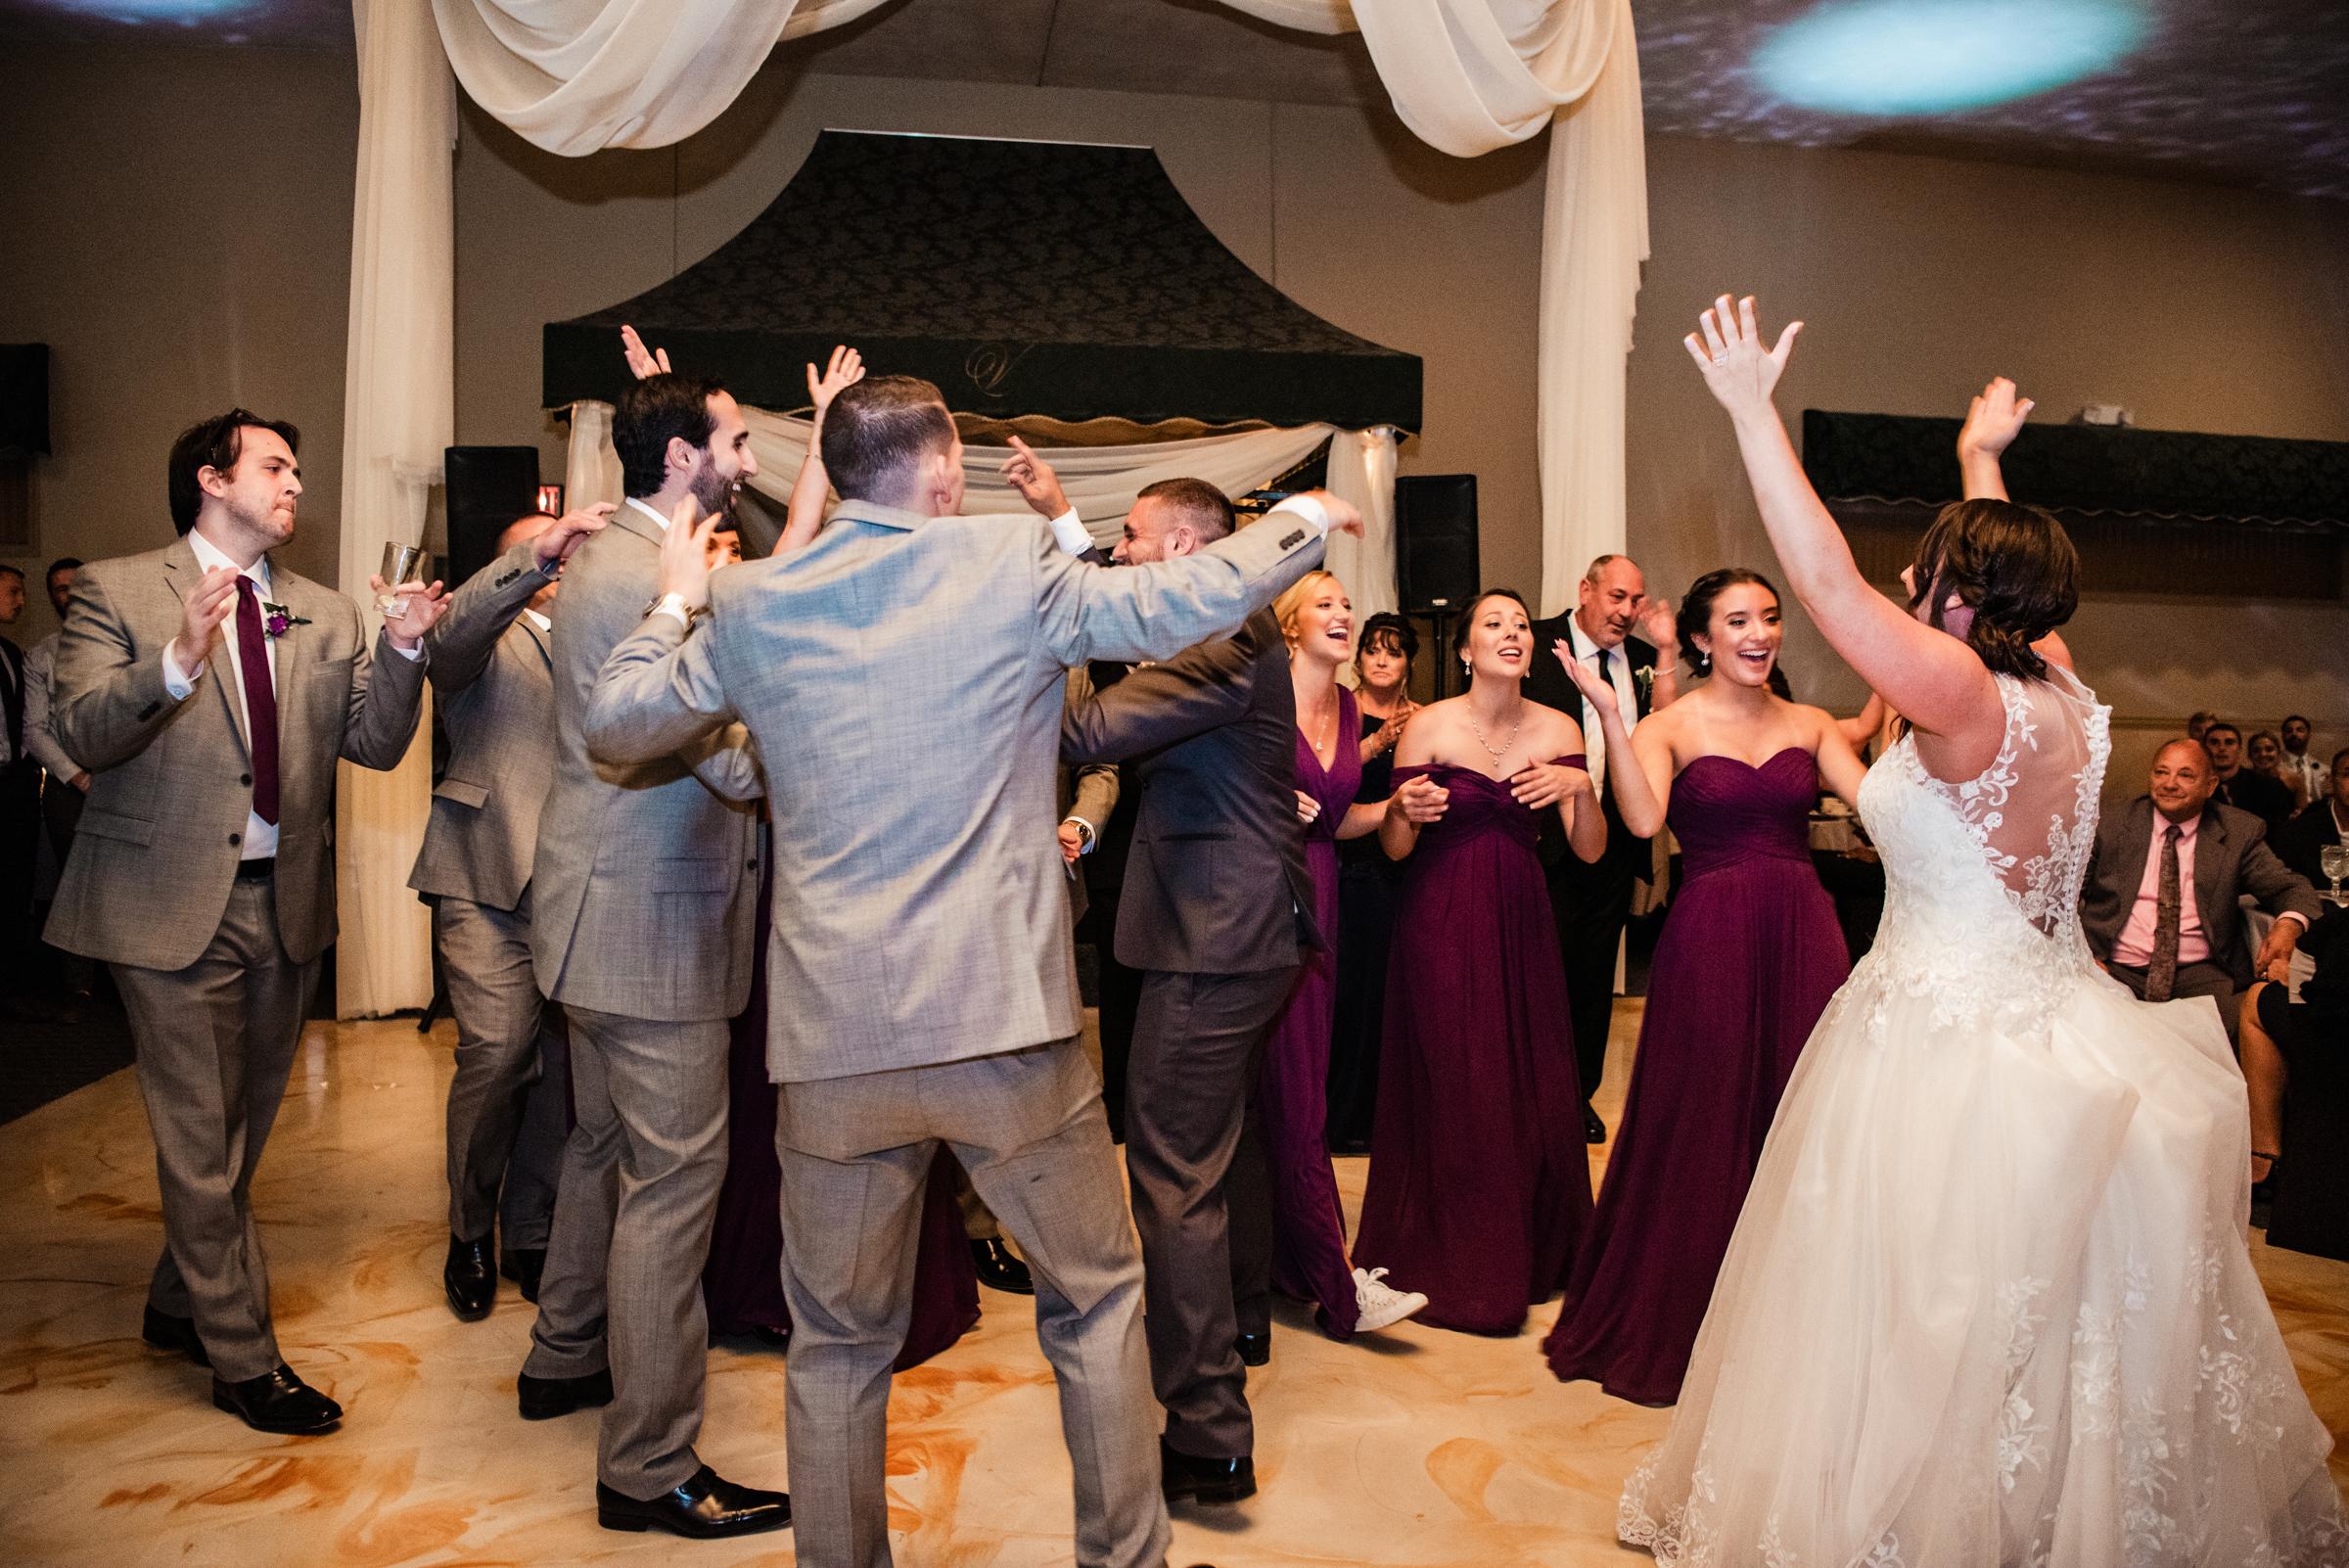 Historic_Old_St_Johns_Church_Valentinos_Banquet_Hall_Central_NY_Wedding_JILL_STUDIO_Rochester_NY_Photographer_DSC_6710.jpg